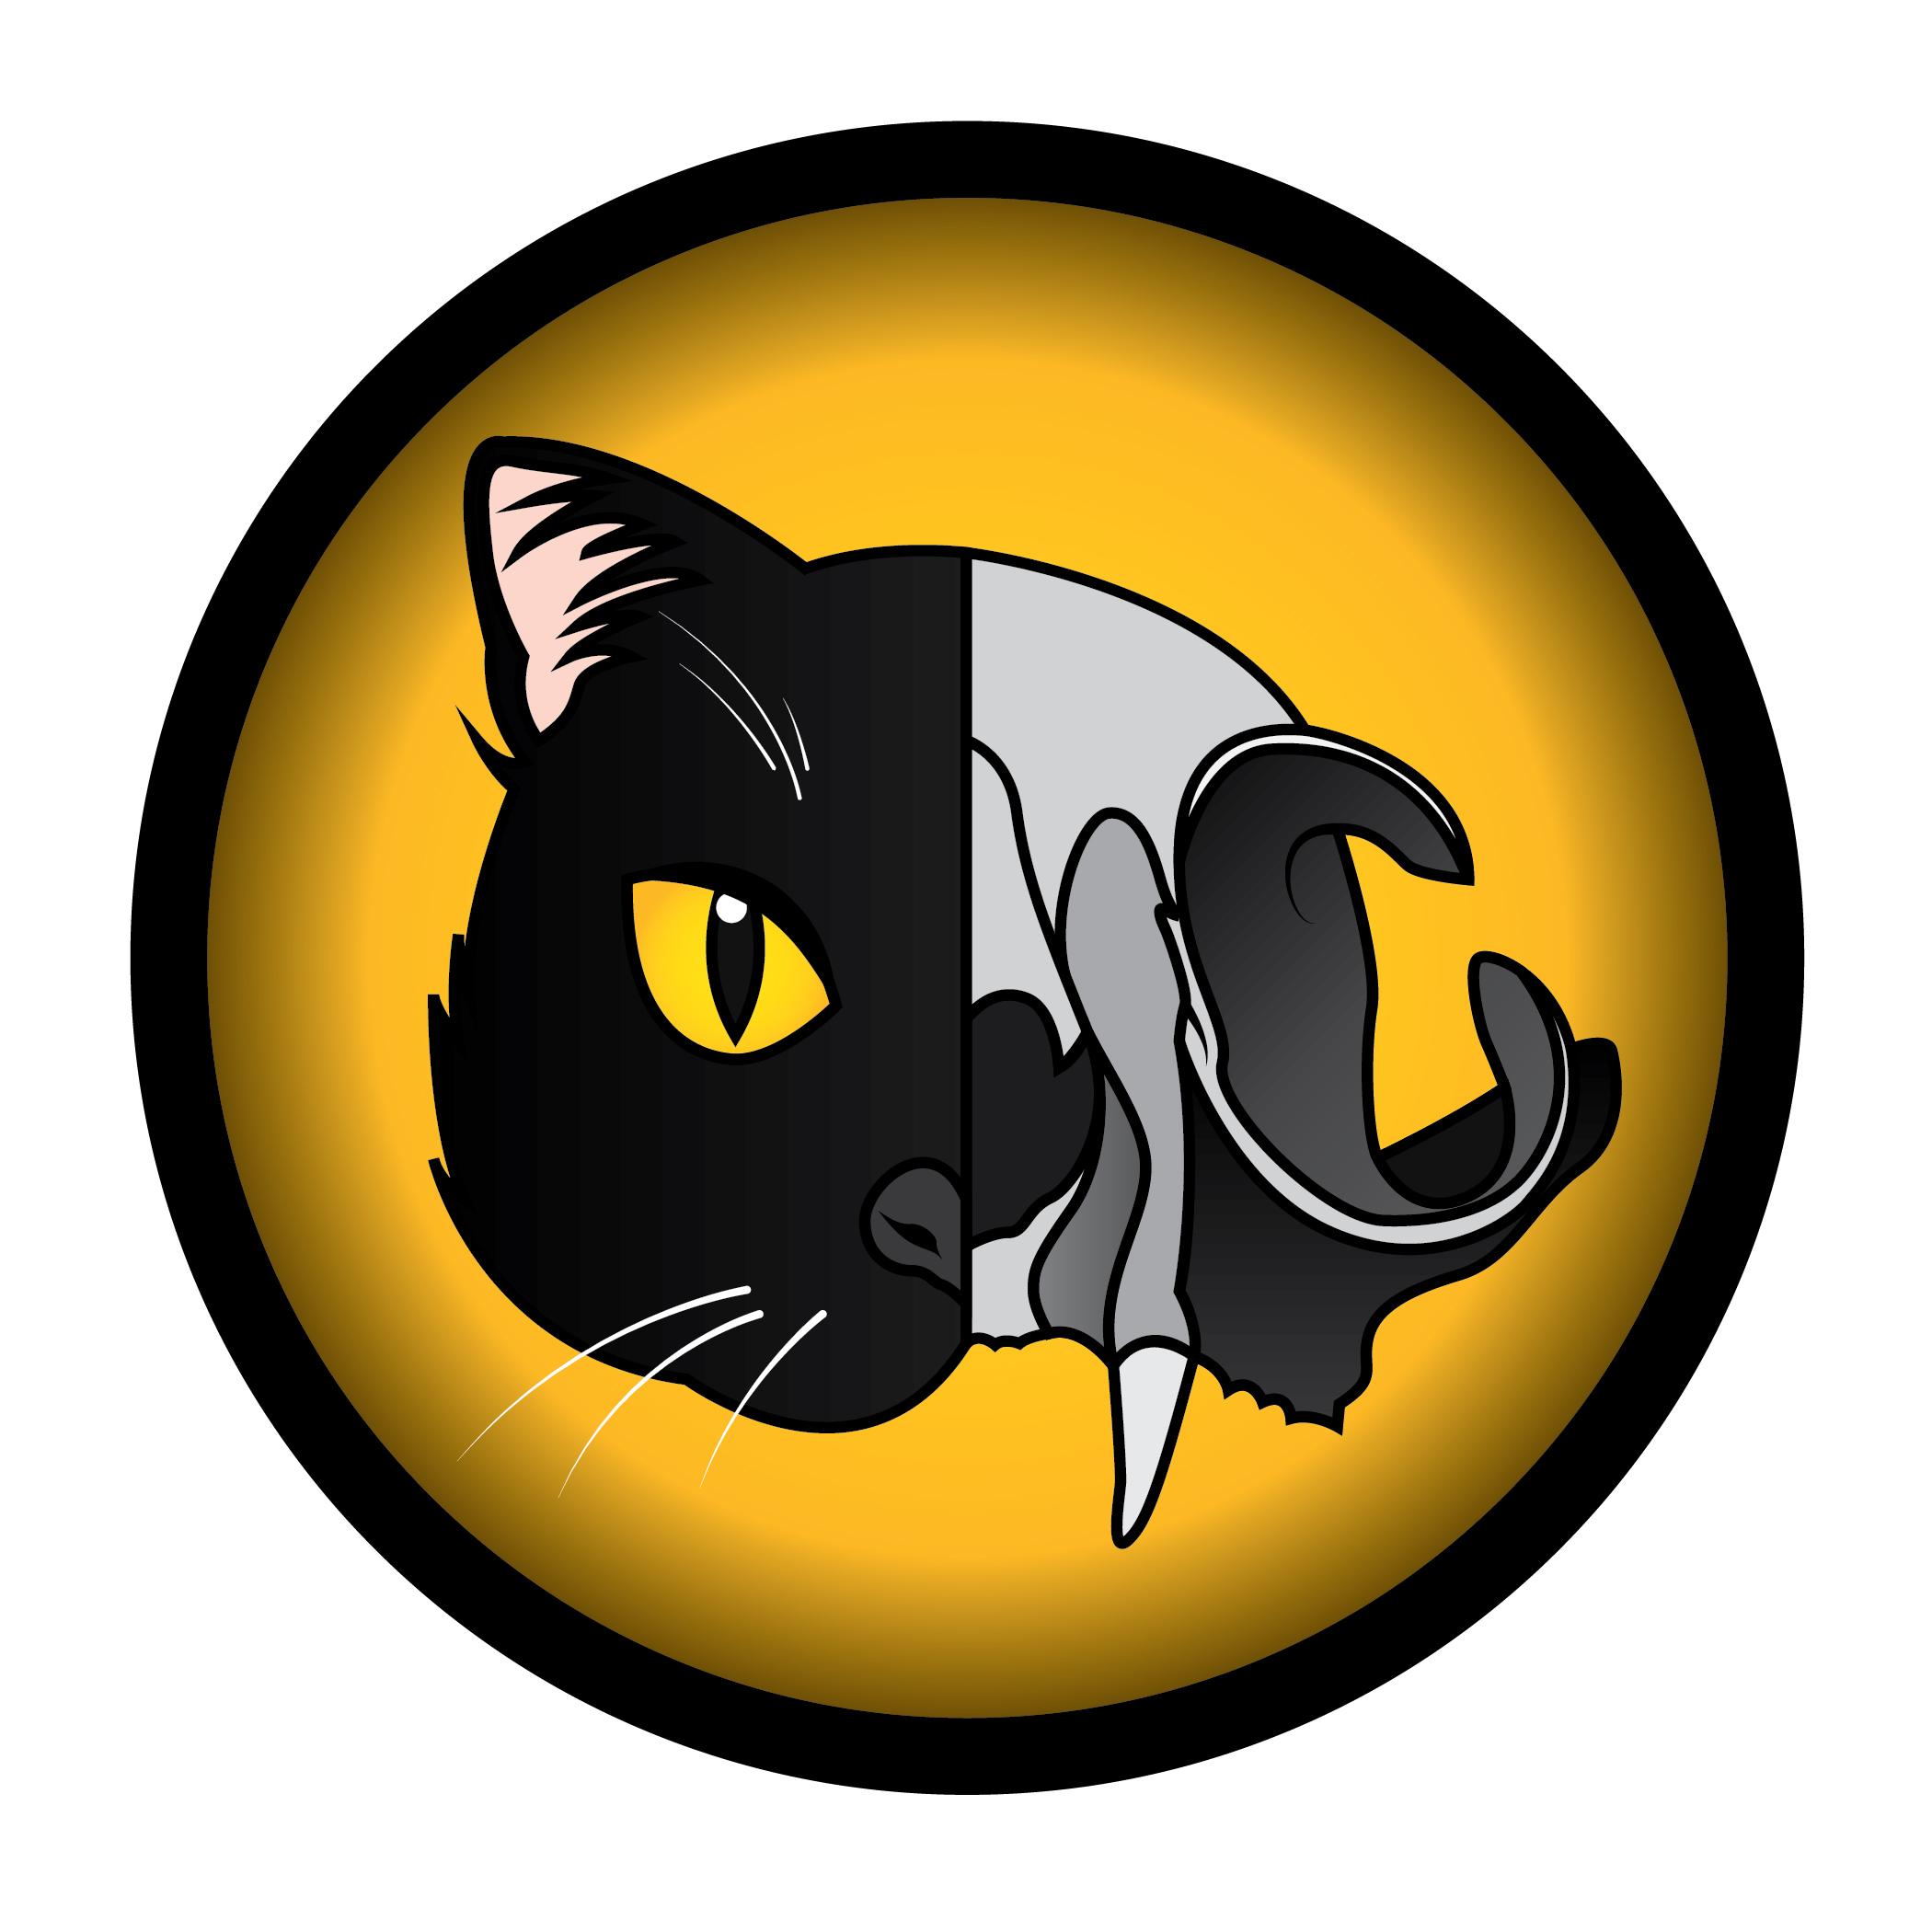 Day 2: BLACK CAT